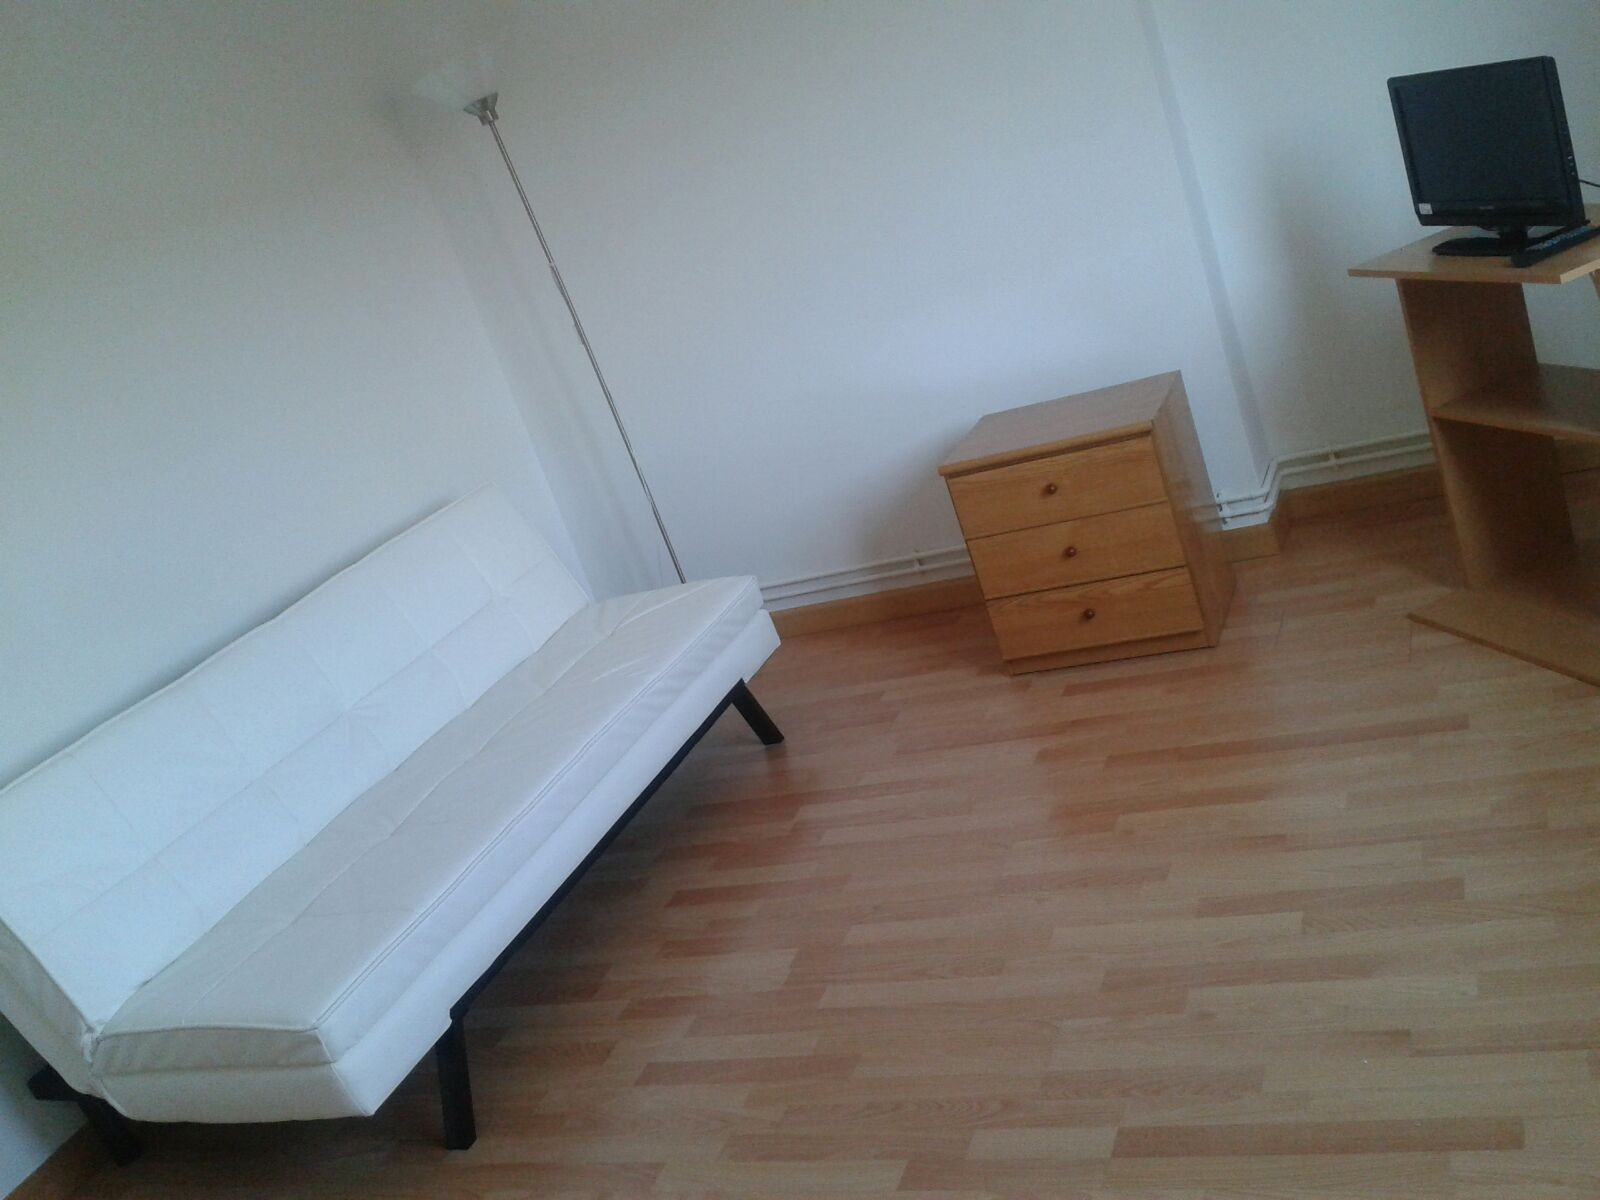 Buscamos compau00f1ero de piso! : Alquiler habitaciones Vitoria